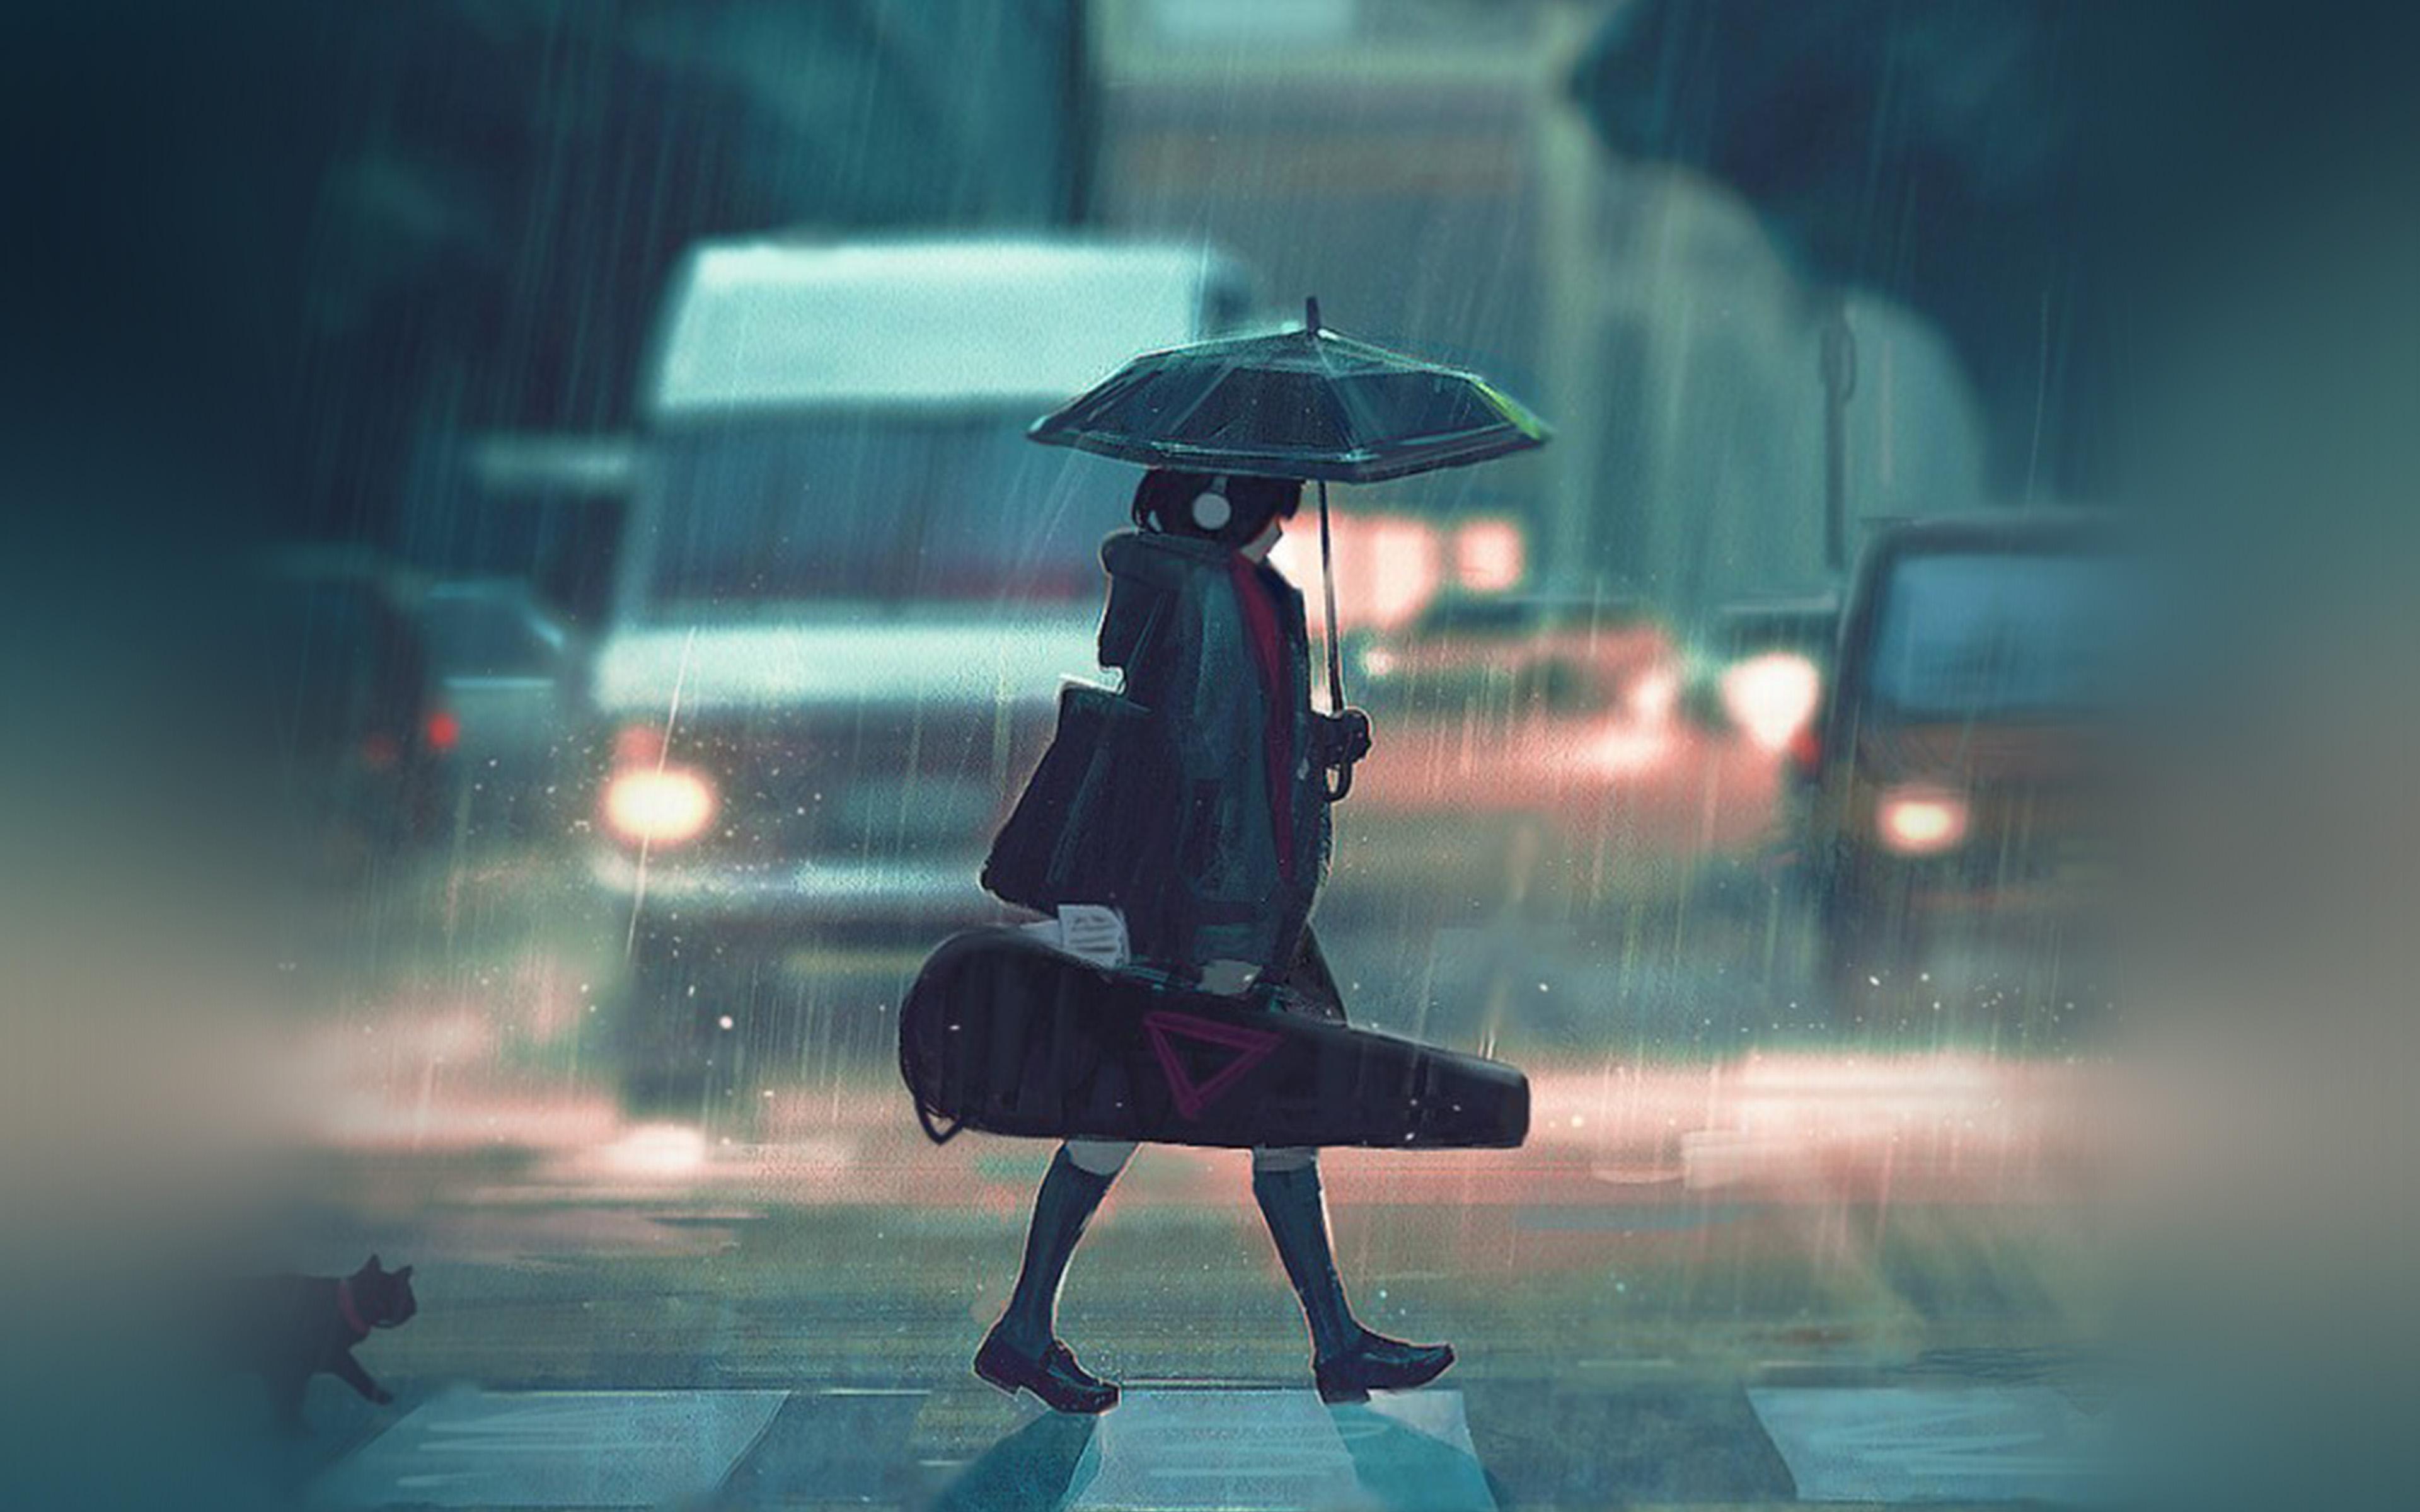 Cute Small Sad Girl Wallpaper Bc89 Rainy Day Anime Paint Girl Art Illustration Wallpaper